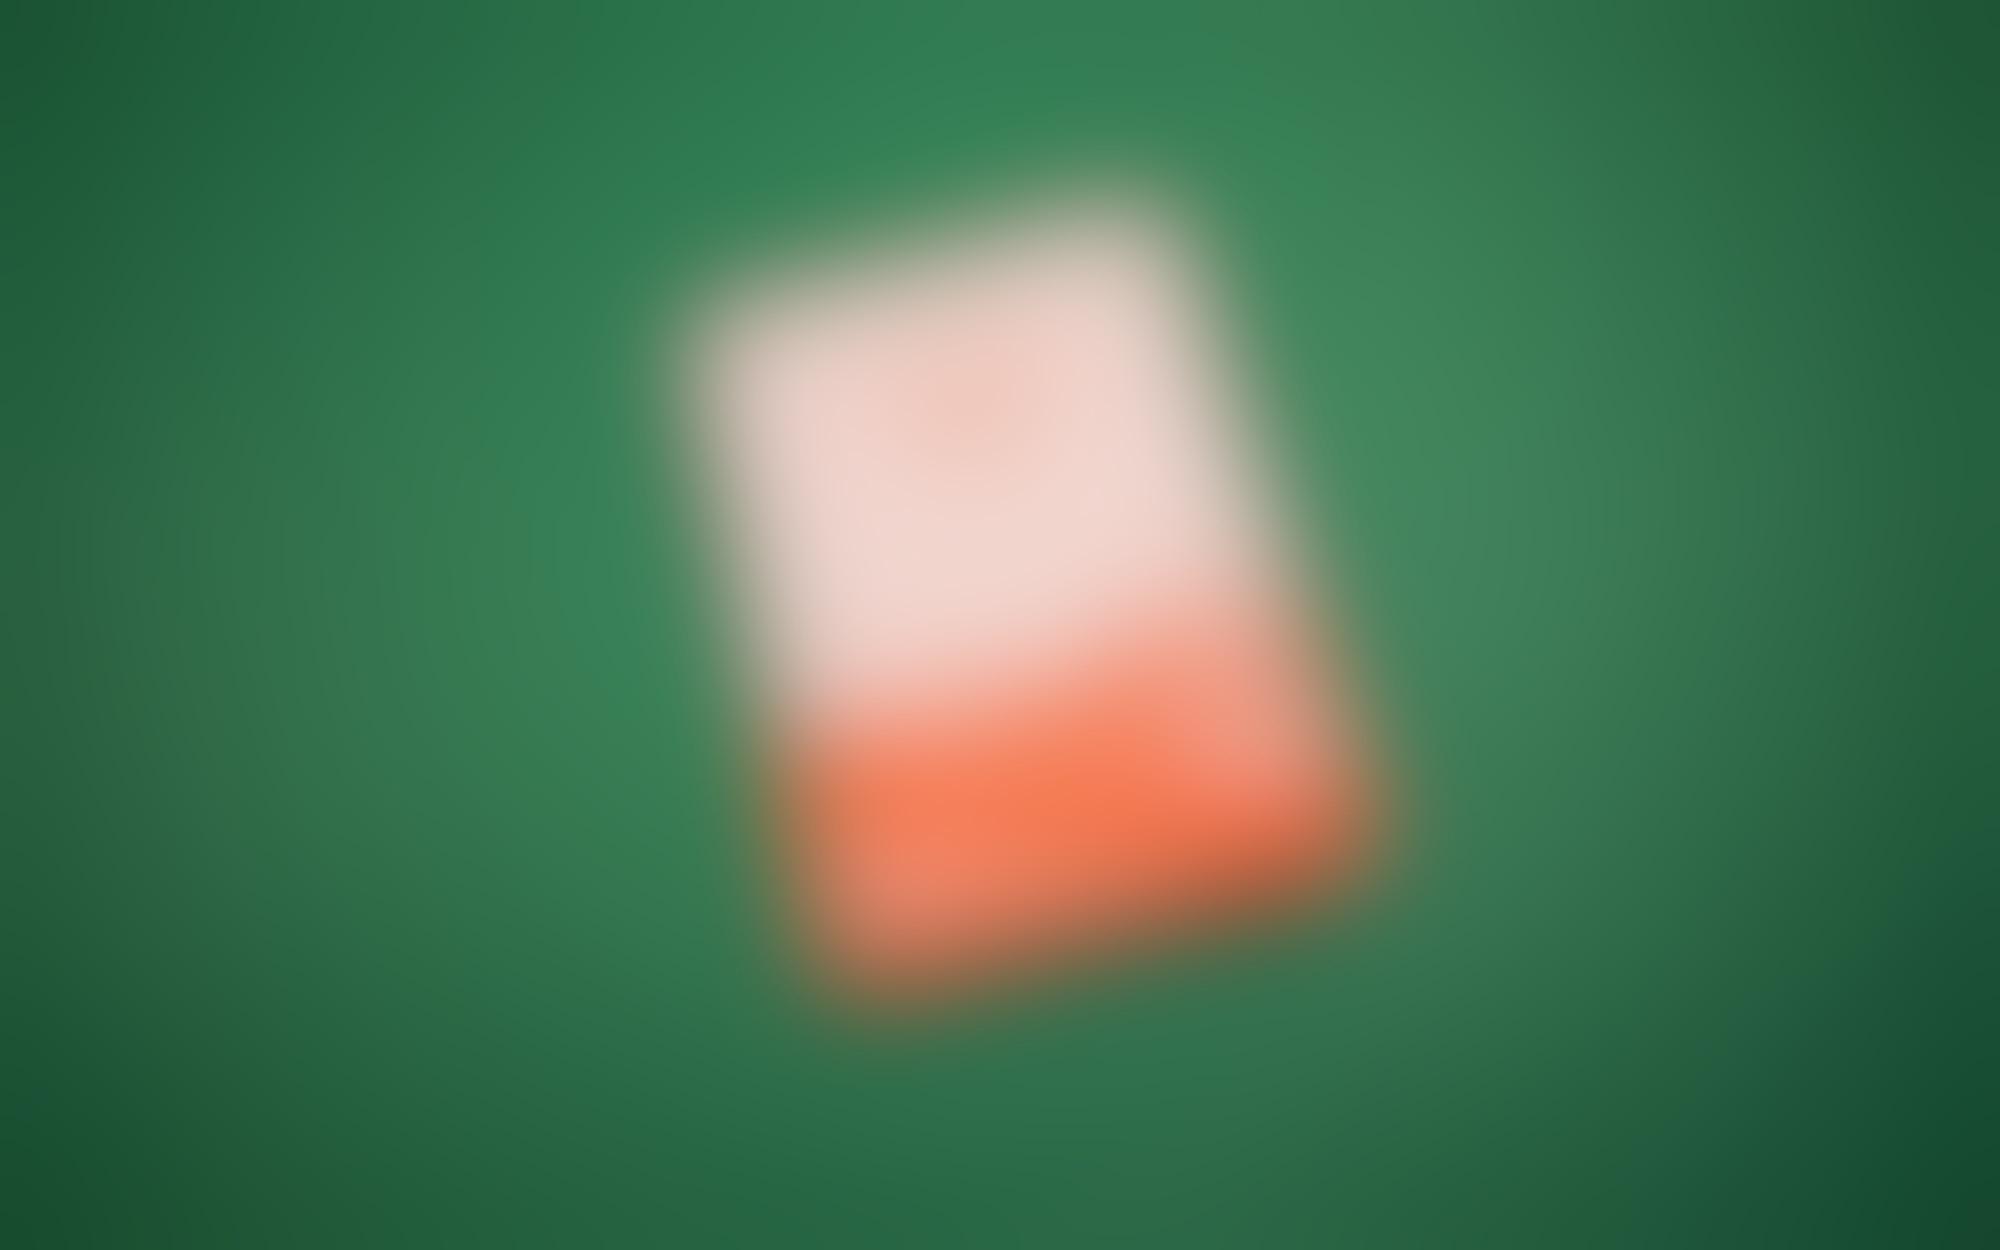 P1130819 autocompressfitresizeixlibphp 1 1 0max h2000max w3 D2000q80s9c2121578b33eb3d57df53e40a7dc086